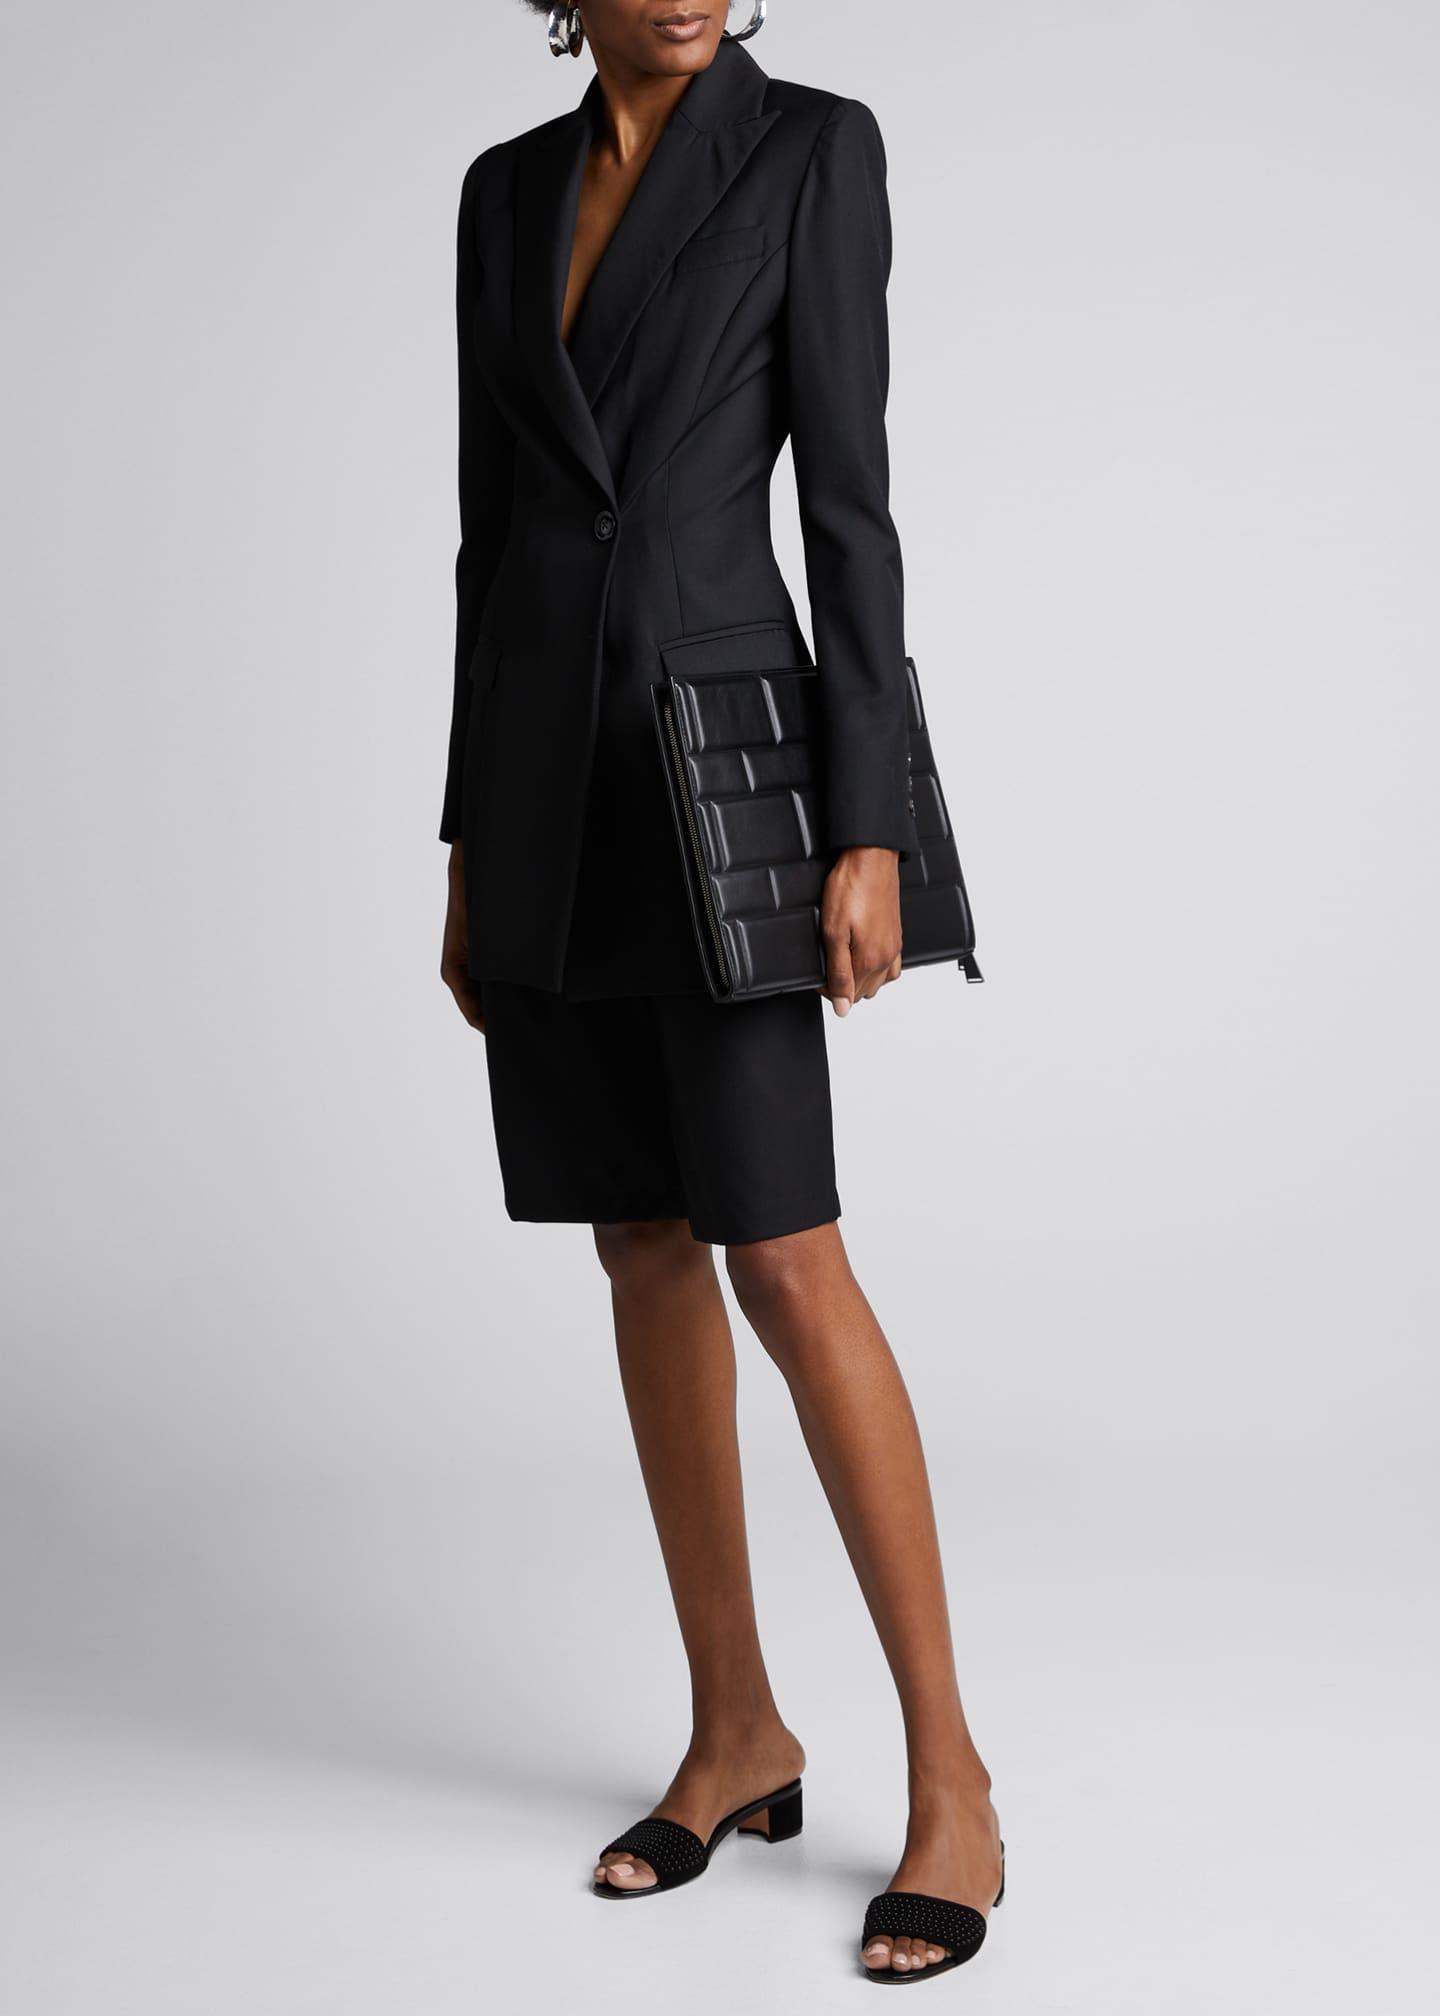 Anna Quan Sienna Longline Wool Jacket